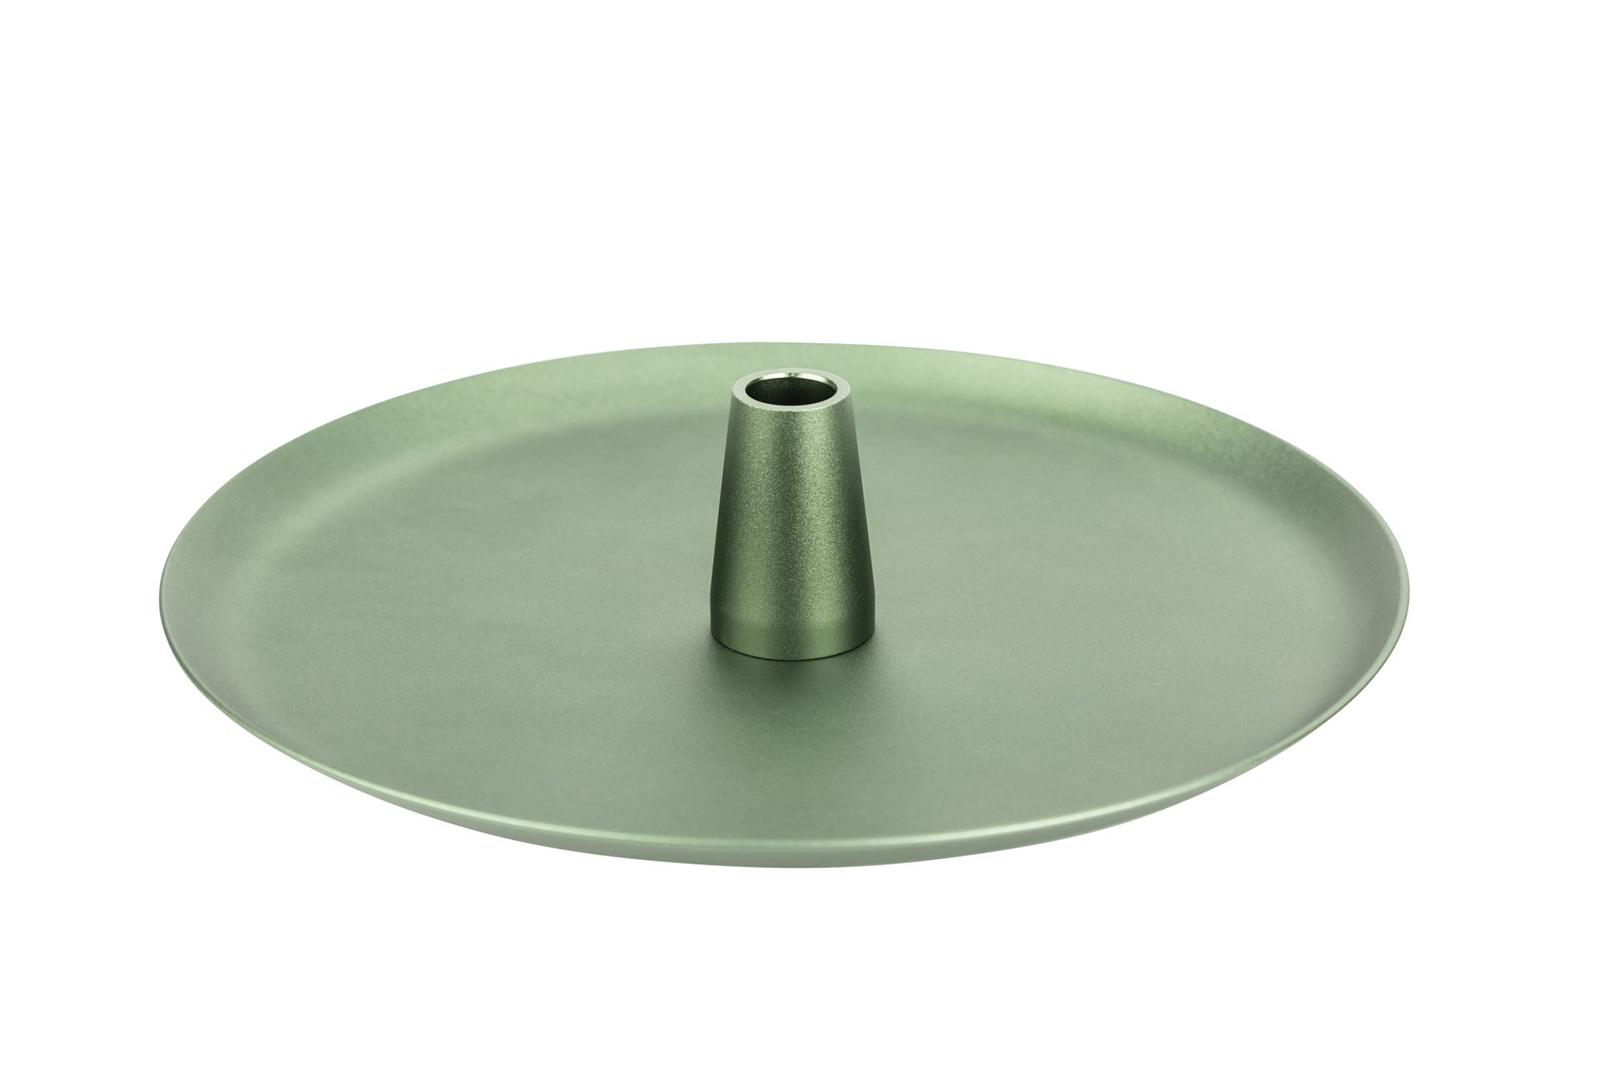 LIMITED EDITION - MOE'S WANTED 2U M2 - Aluminium Grün matt / Green matt